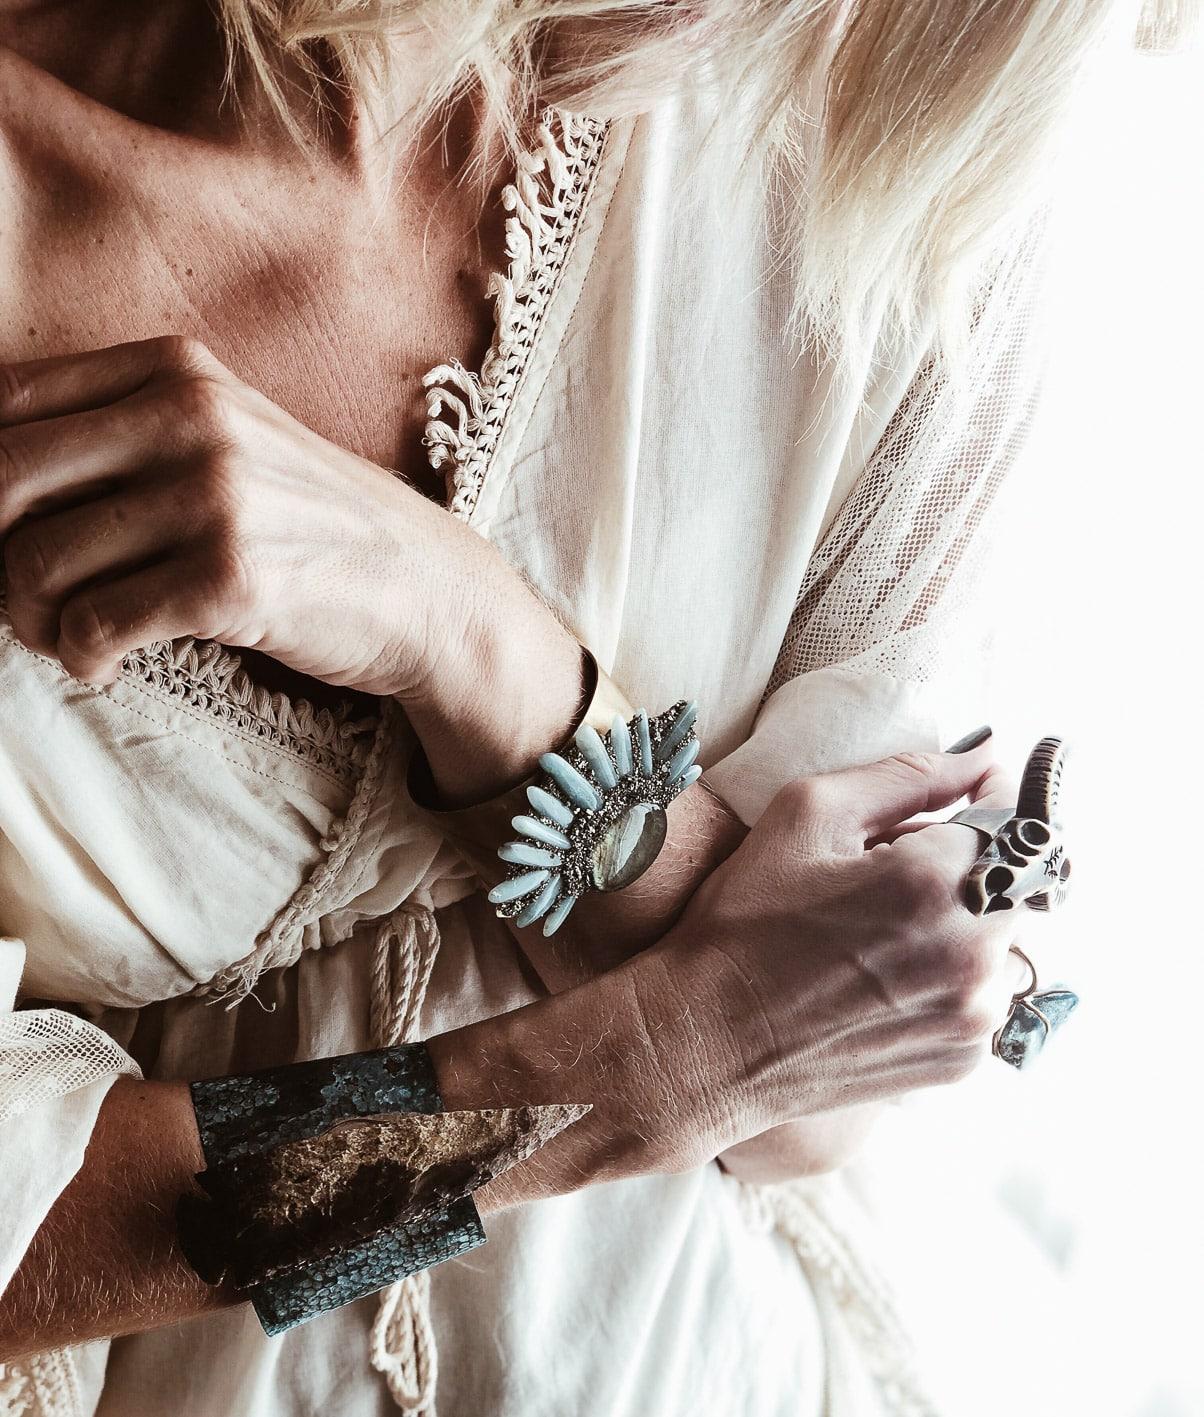 Carnet Sauvage - Christina Rose33-min.jpg